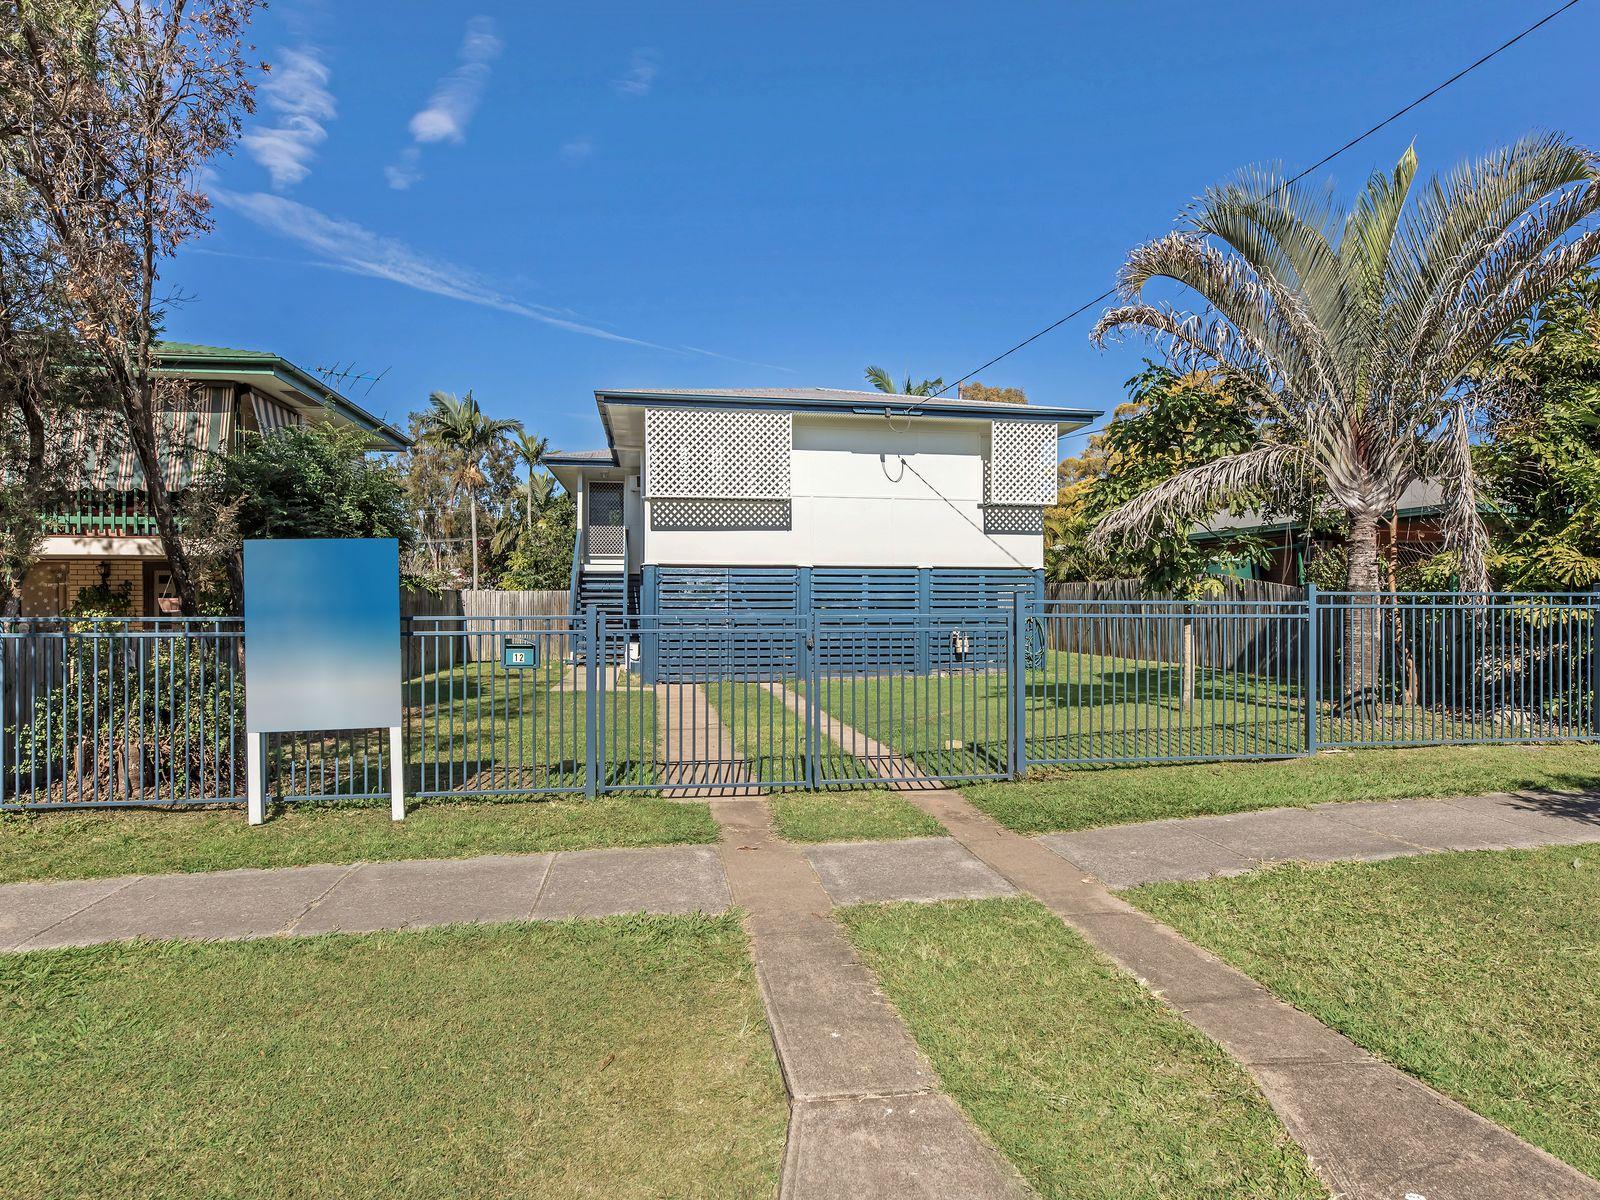 12 Kynance Street, Leichhardt, QLD 4305